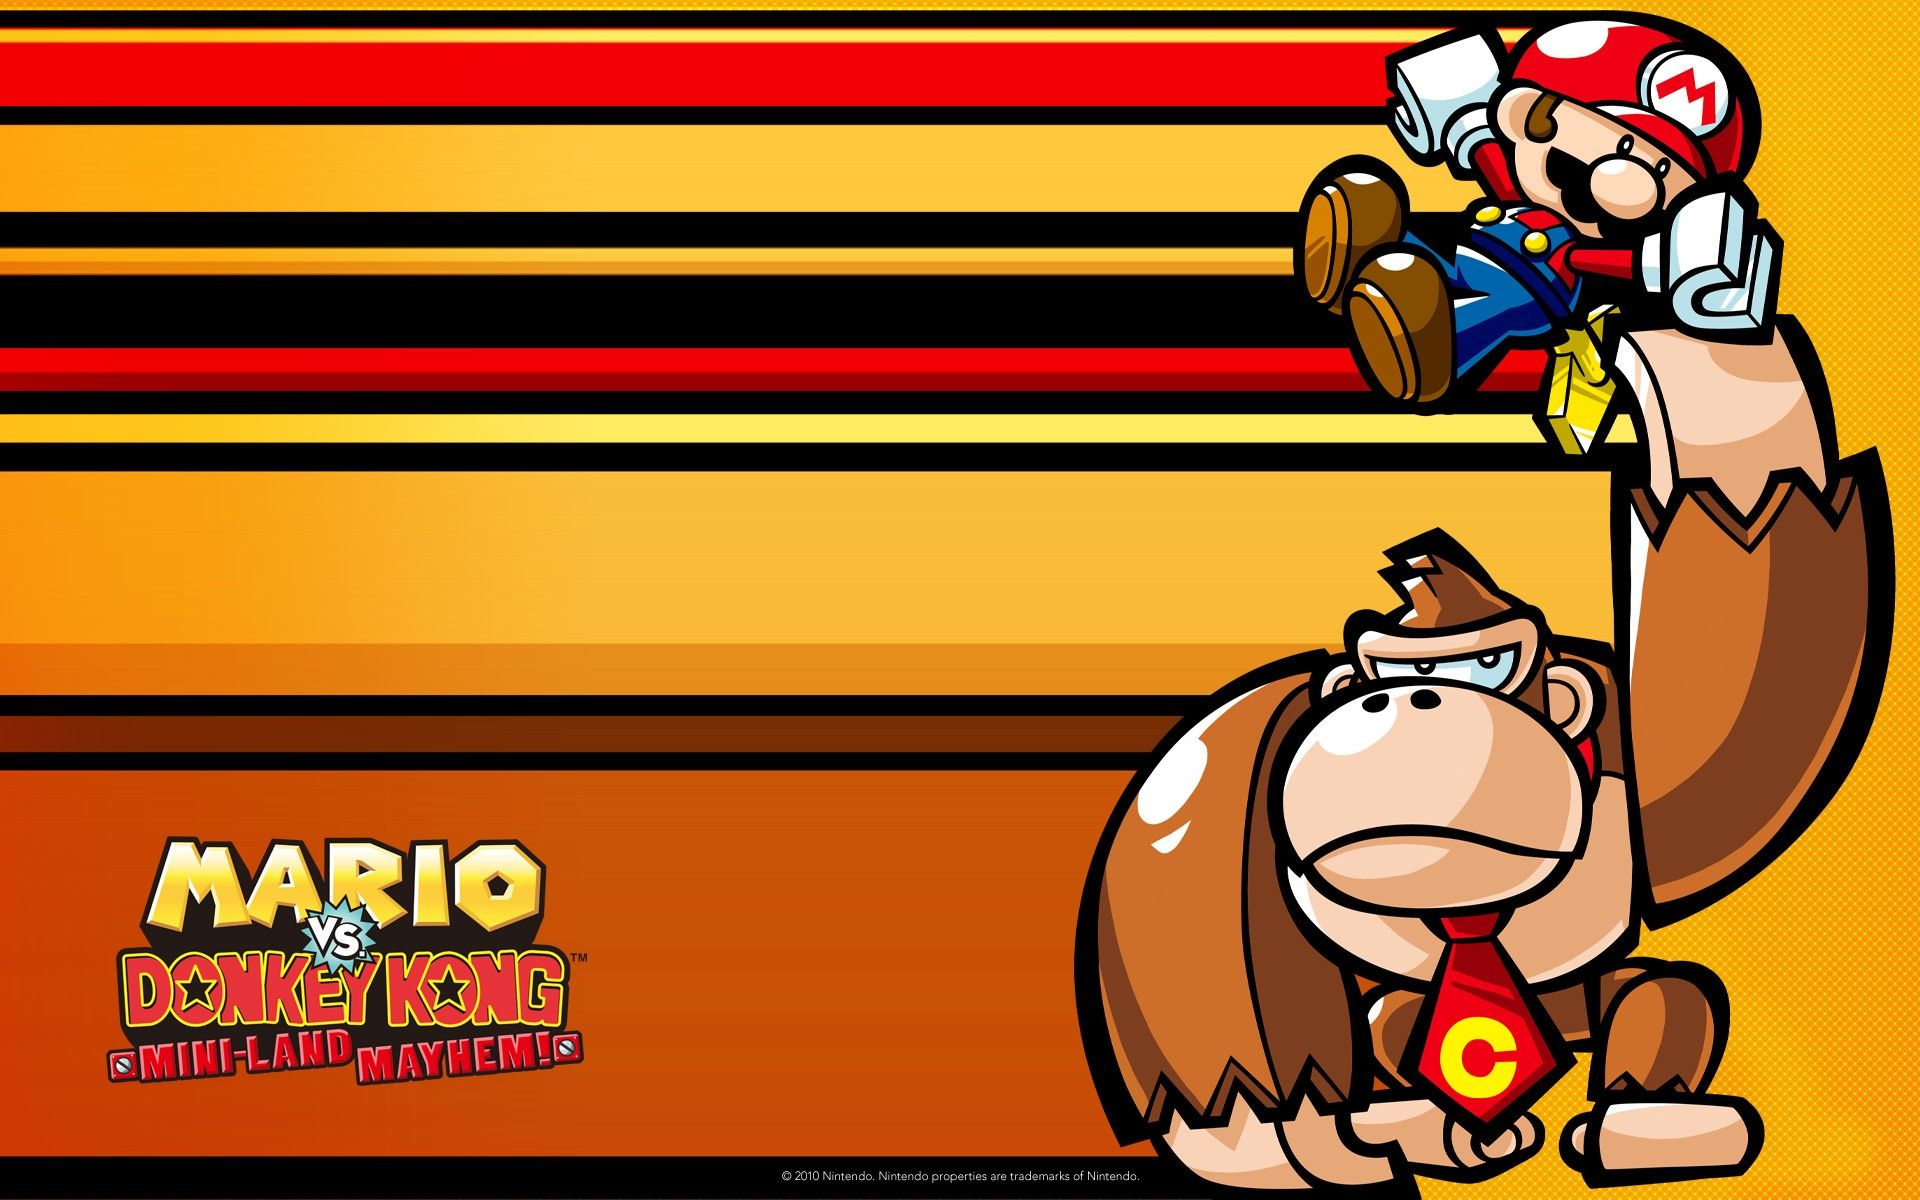 Great Wallpaper Home Screen Donkey Kong - 54193a496f52f322be3a848407b67b50  Image_483122.jpg